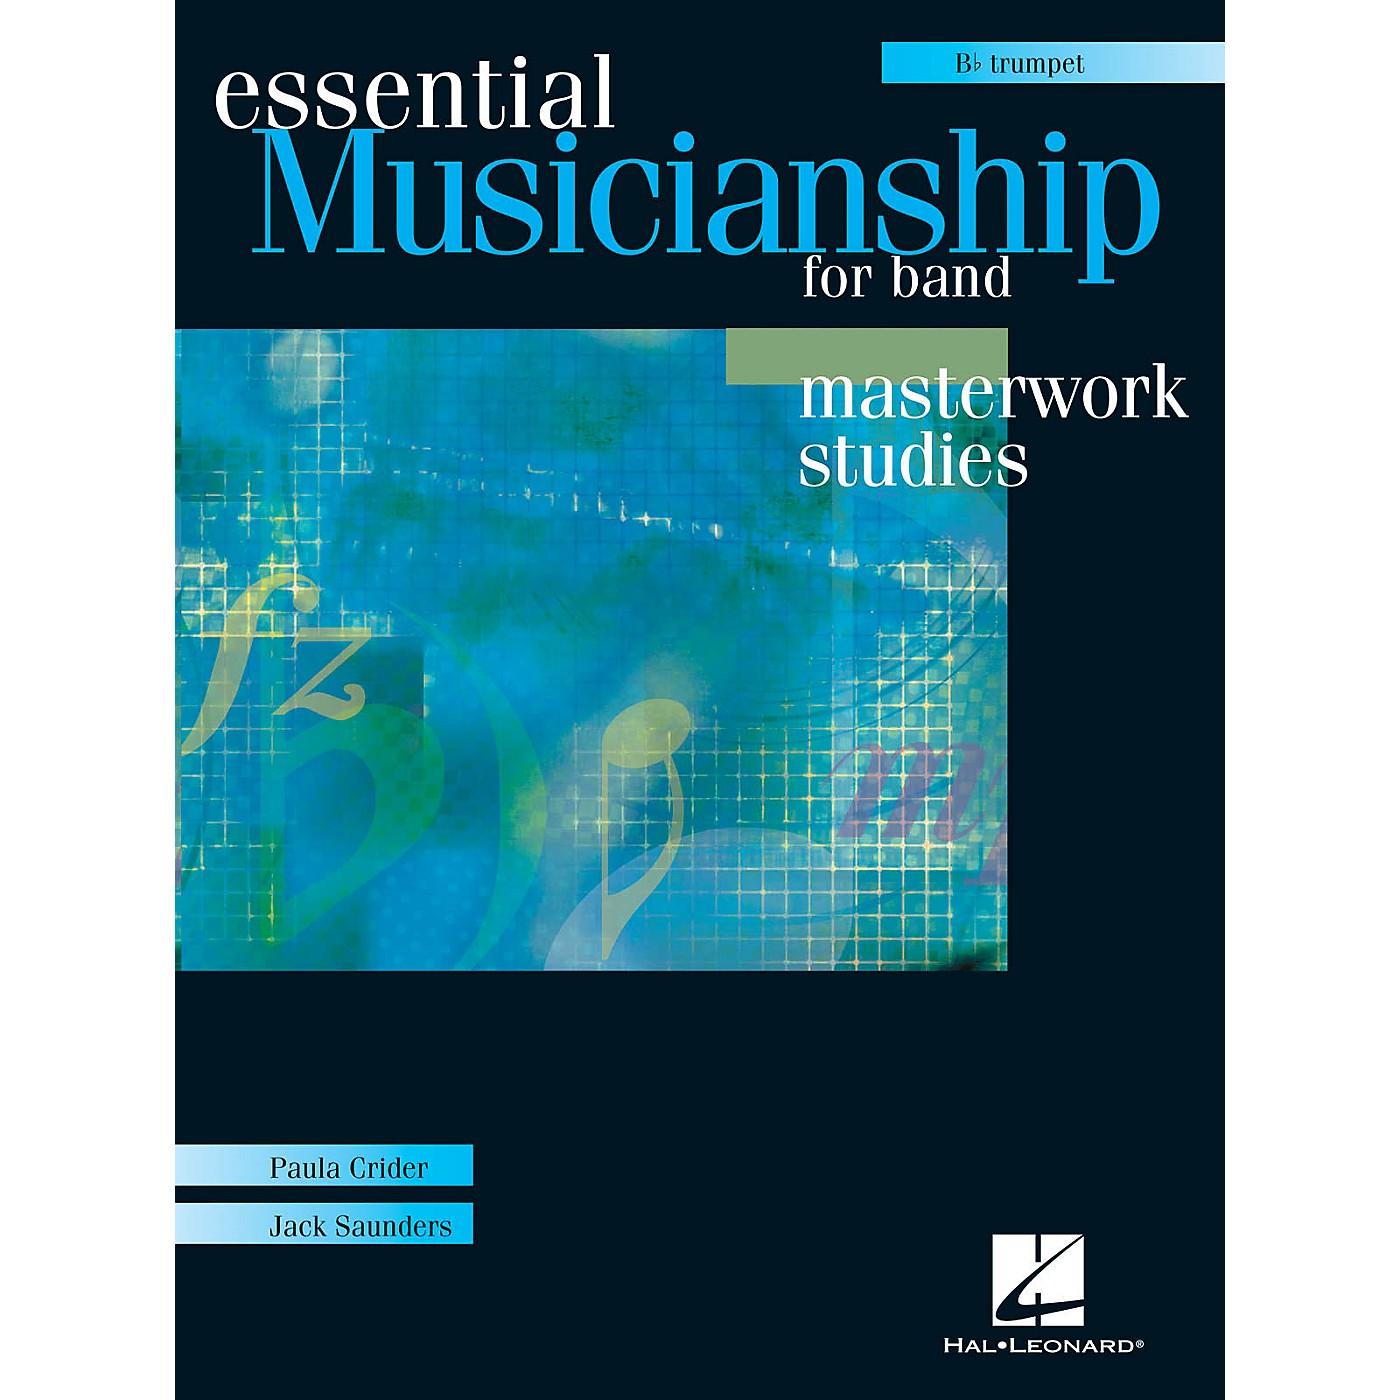 Hal Leonard Essential Musicianship for Band - Masterwork Studies (Trumpet) Concert Band thumbnail